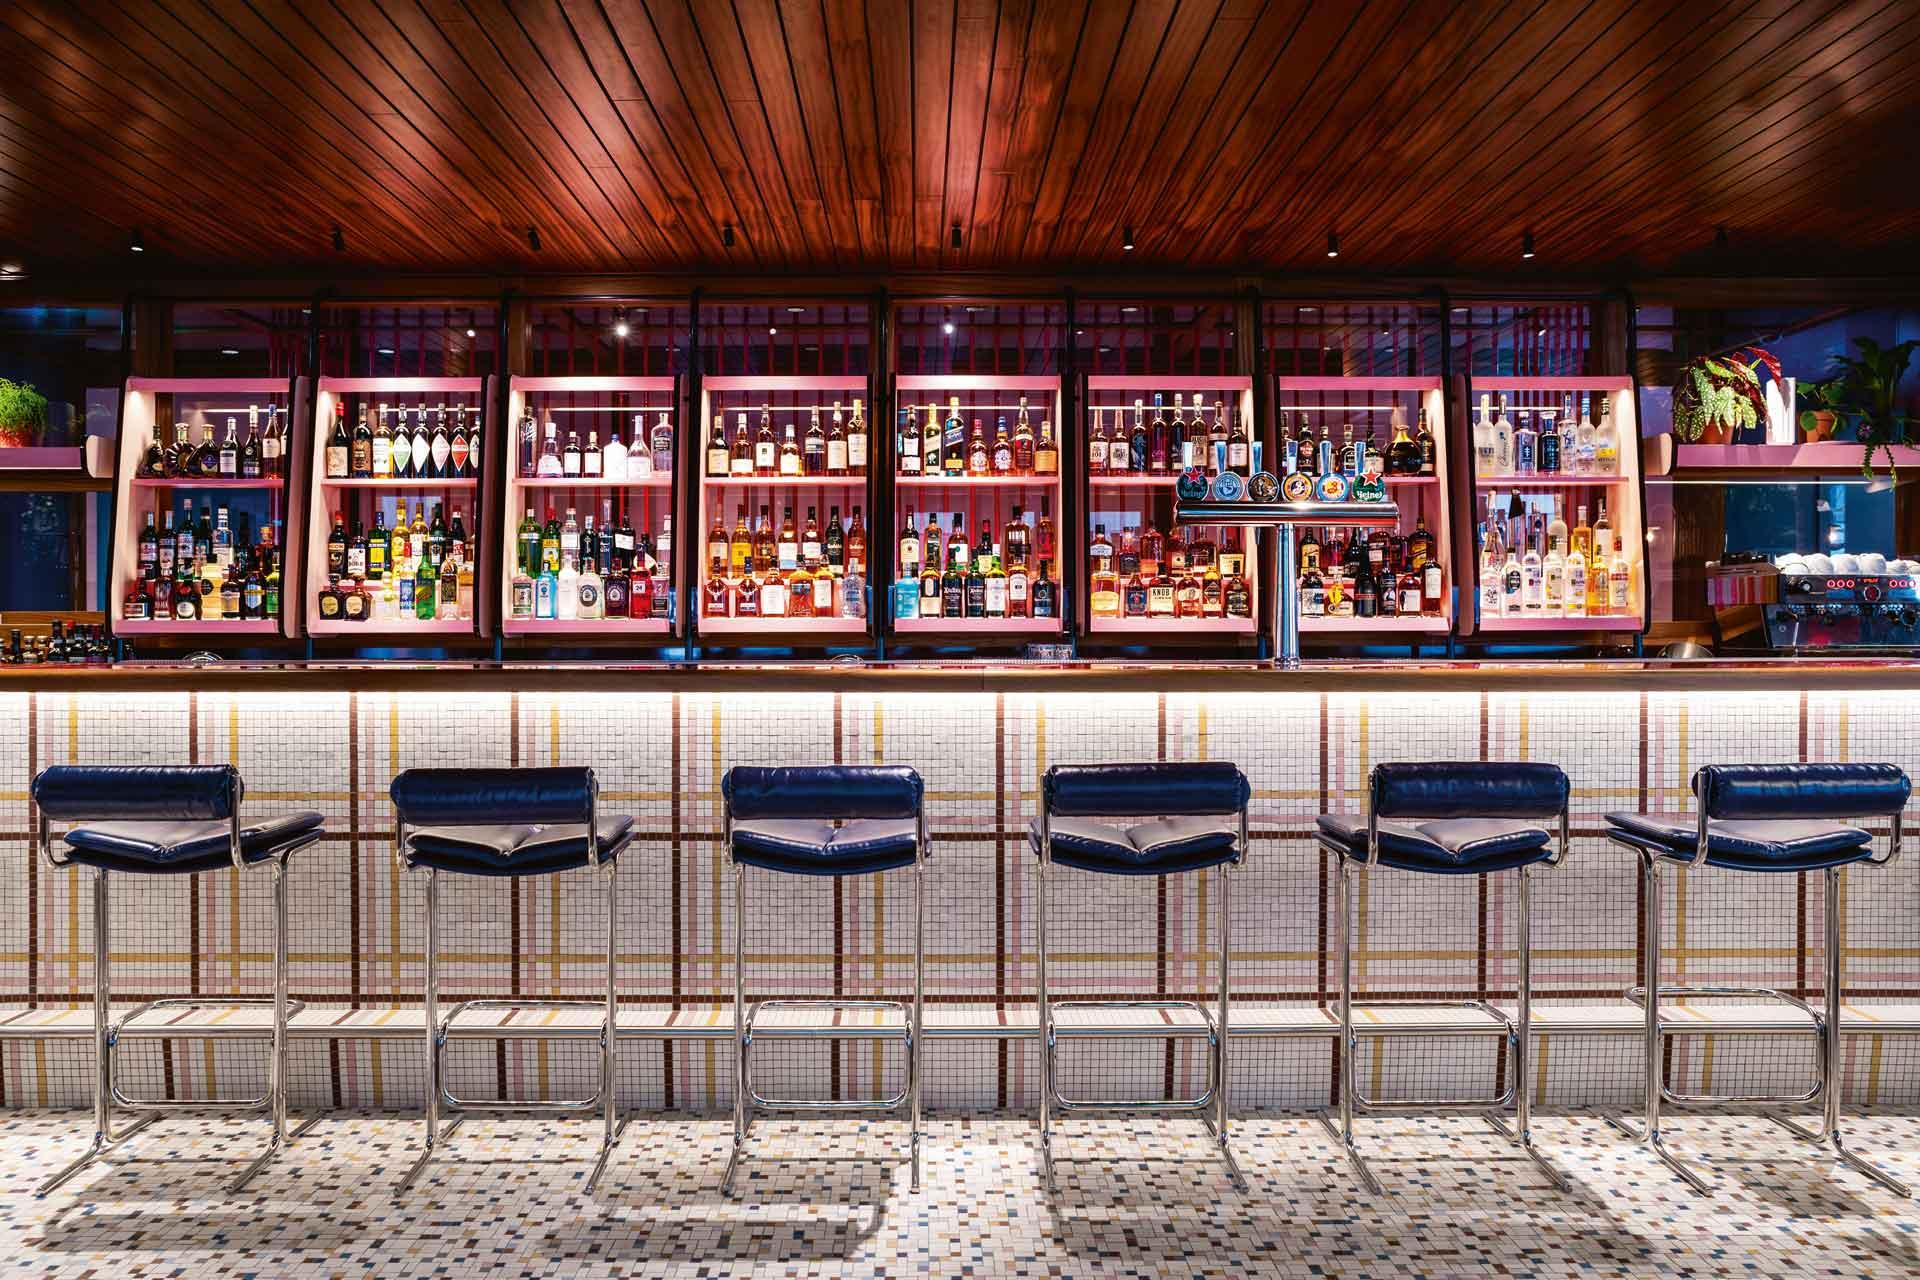 The Double Standard bar inside The Standard in King's Cross